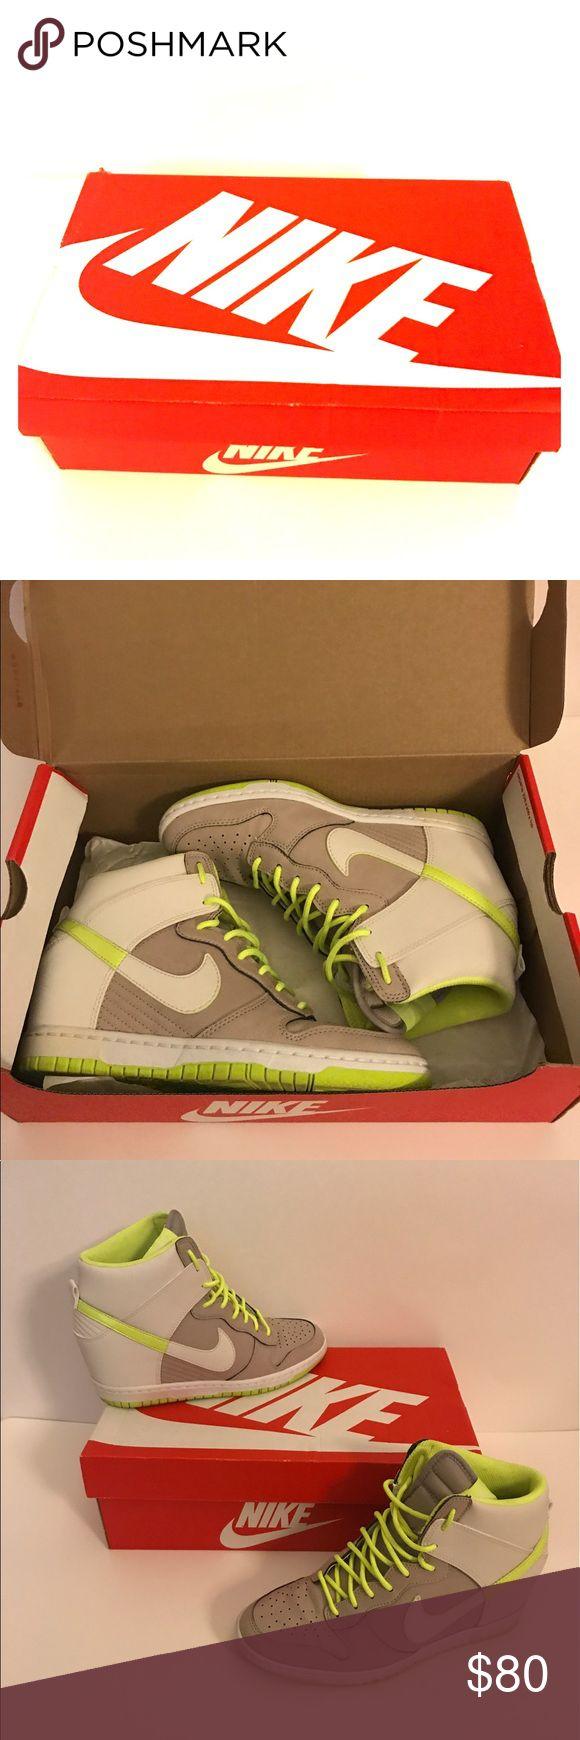 Nike Wedges Sneakers Neon Nike Wedges sneakers. Heeled sneakers worn twice! Nike Shoes